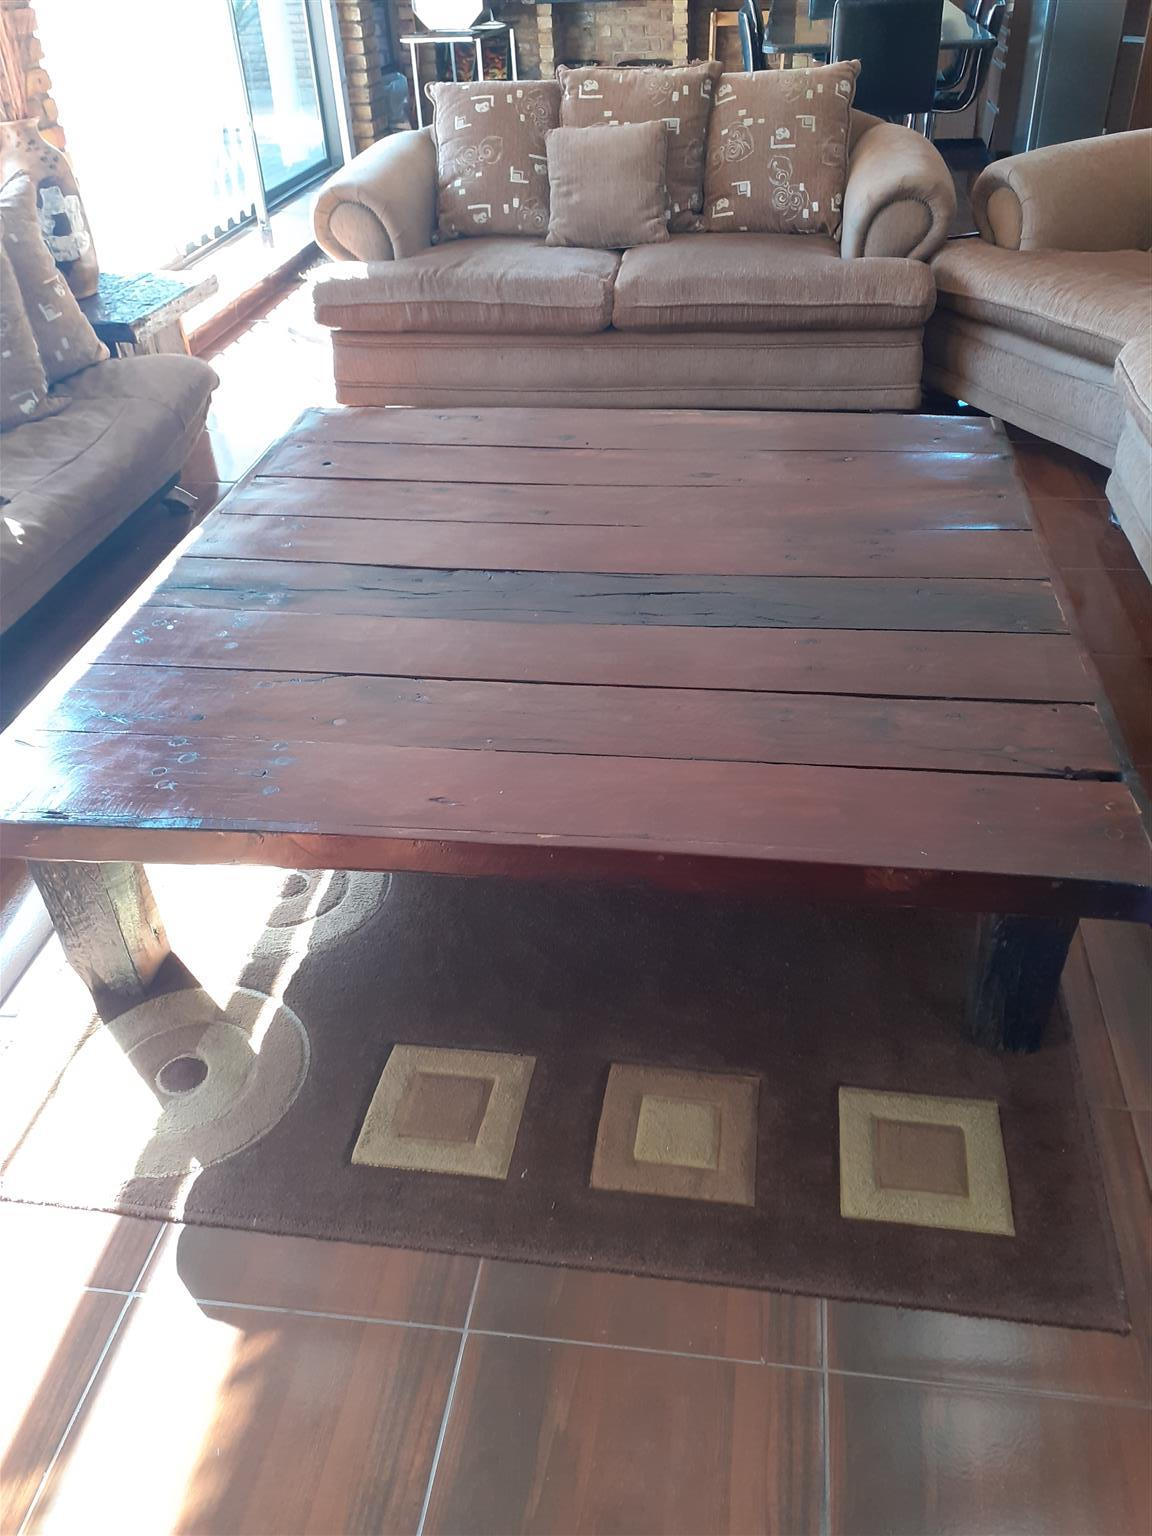 Sleeperwood coffee table